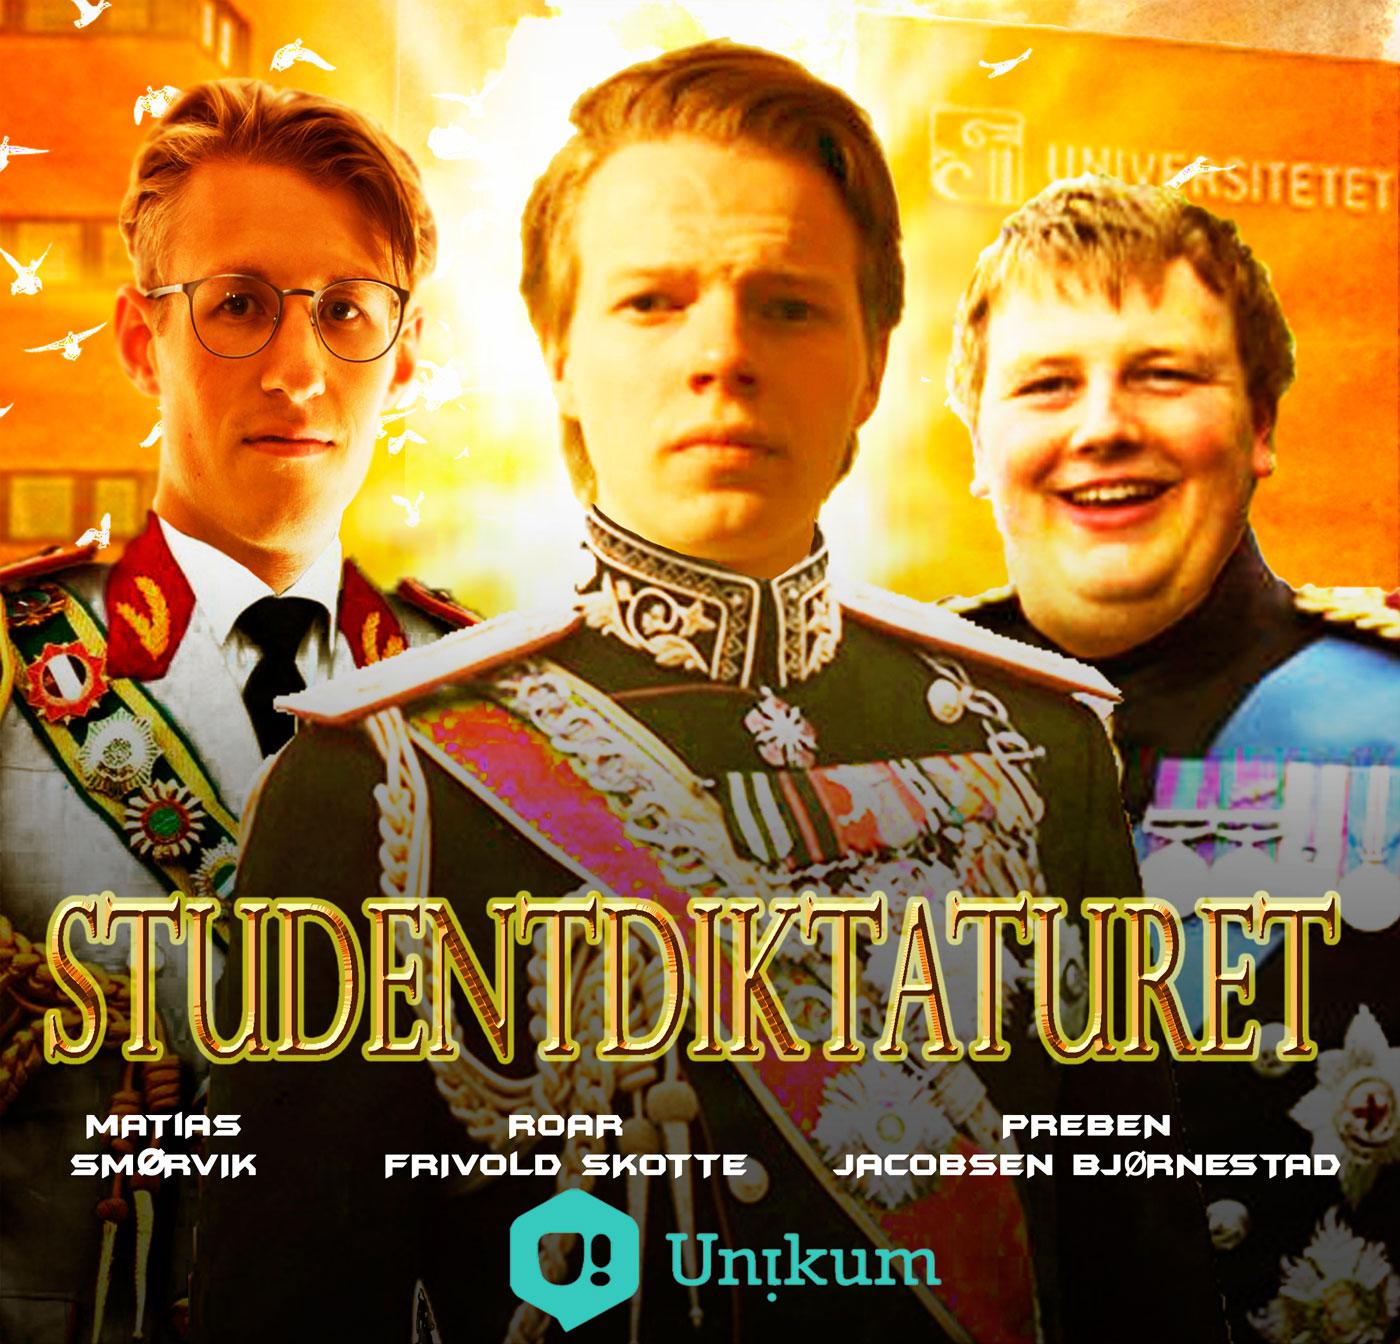 Studentdiktaturet: Preben vet hvem som vinner STA-valget